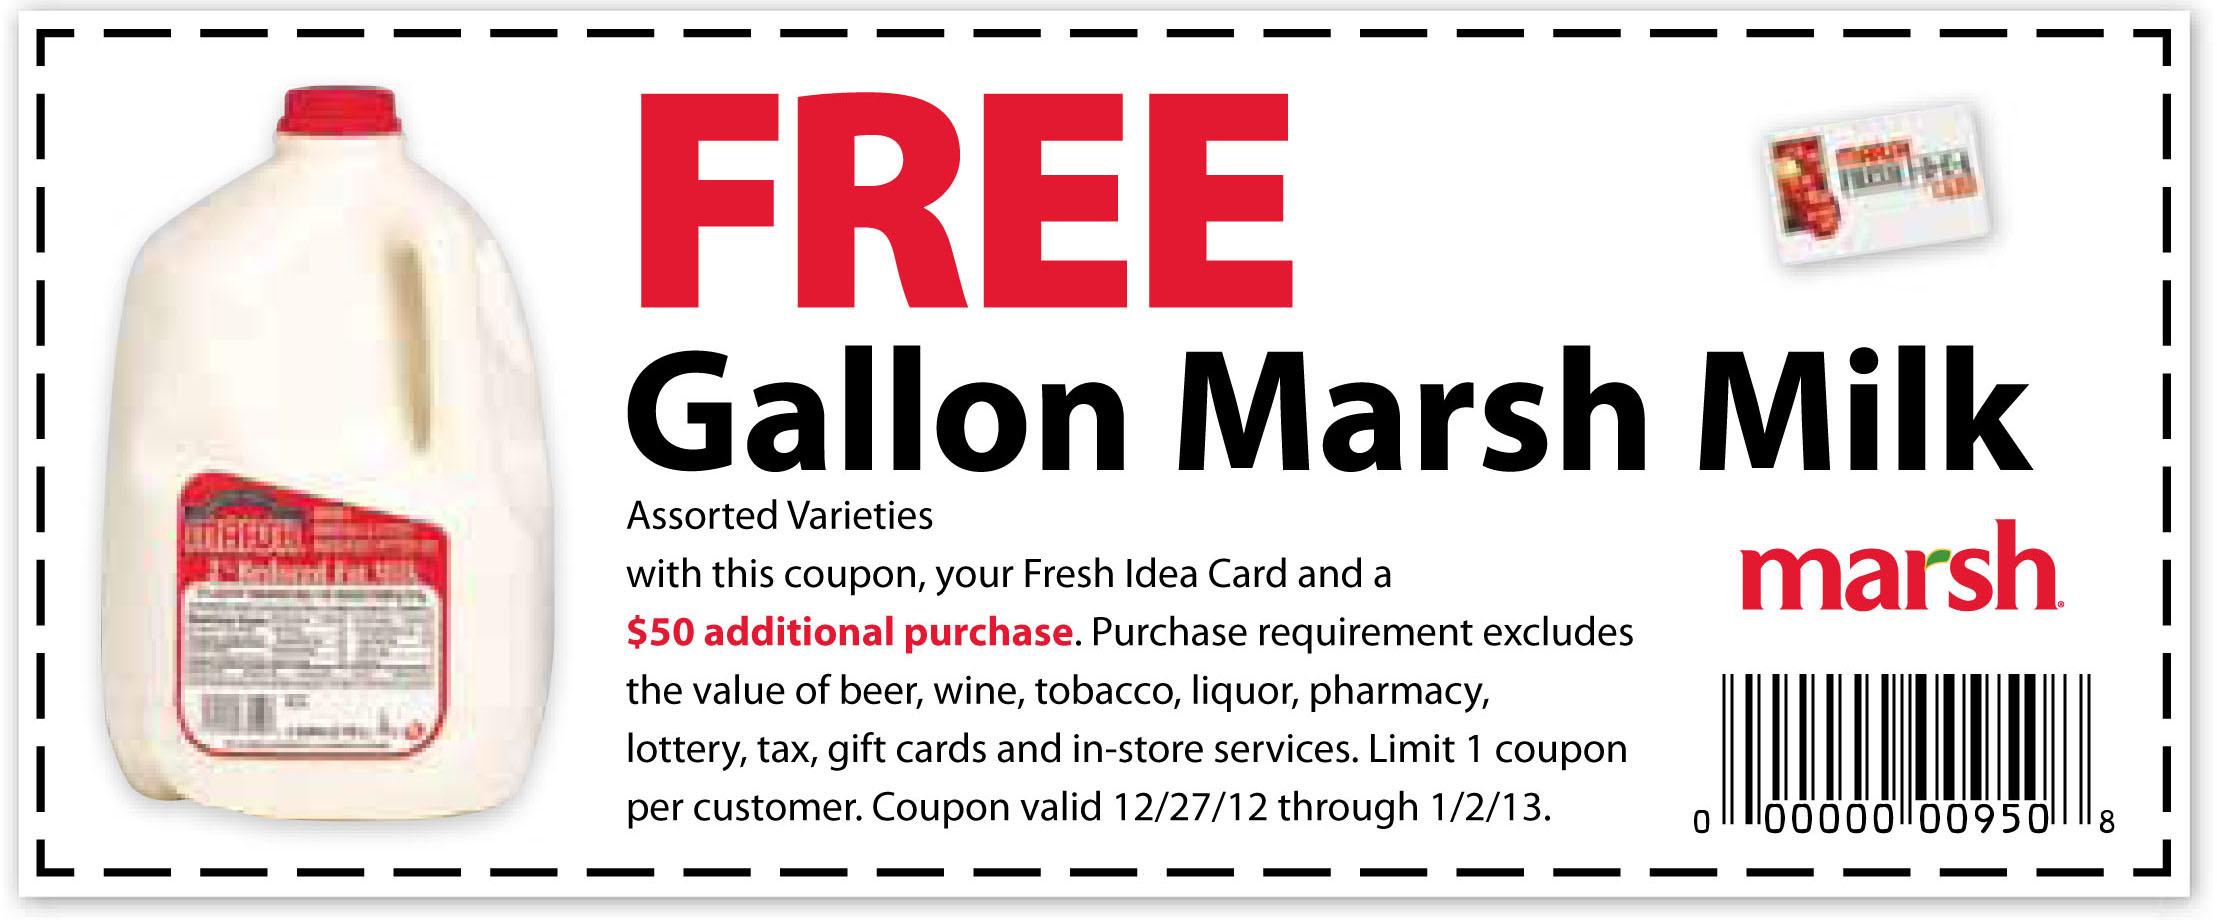 Printable Beer Vouchers | Download Them Or Print - Free Printable Beer Coupons